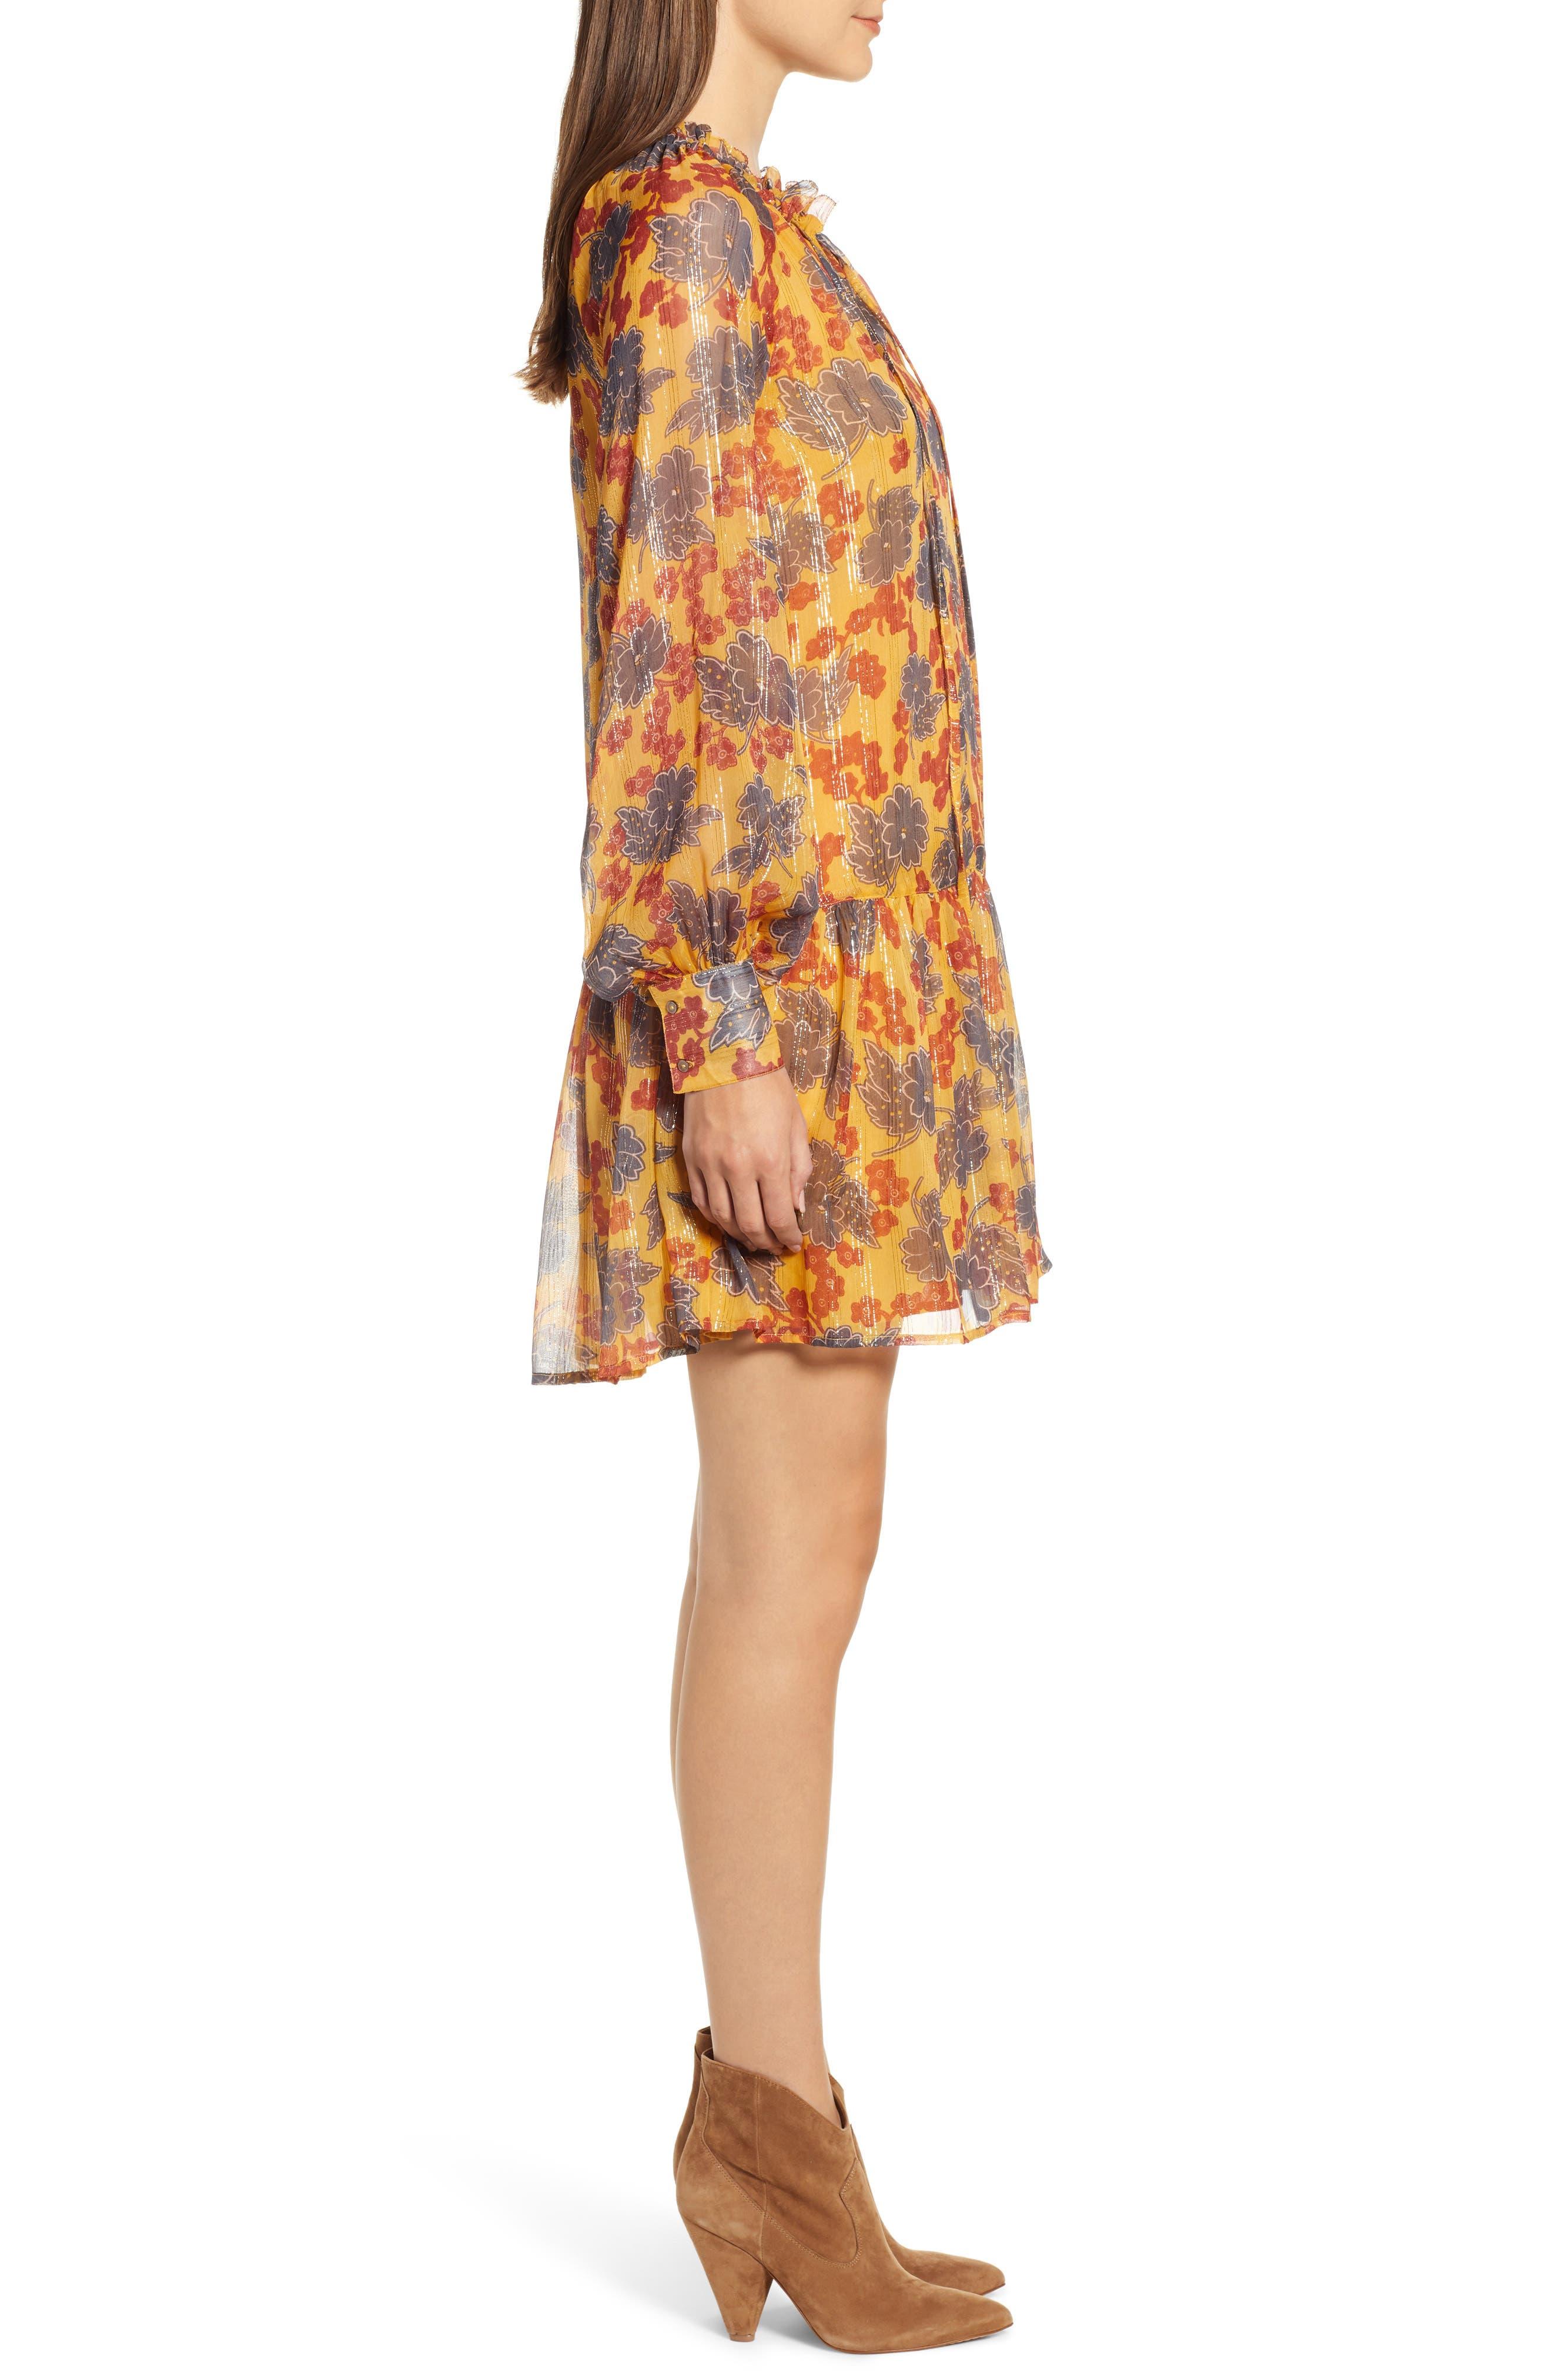 Metallic Stripe Floral Print Dress,                             Alternate thumbnail 3, color,                             YELLOW AND BURGUNDY